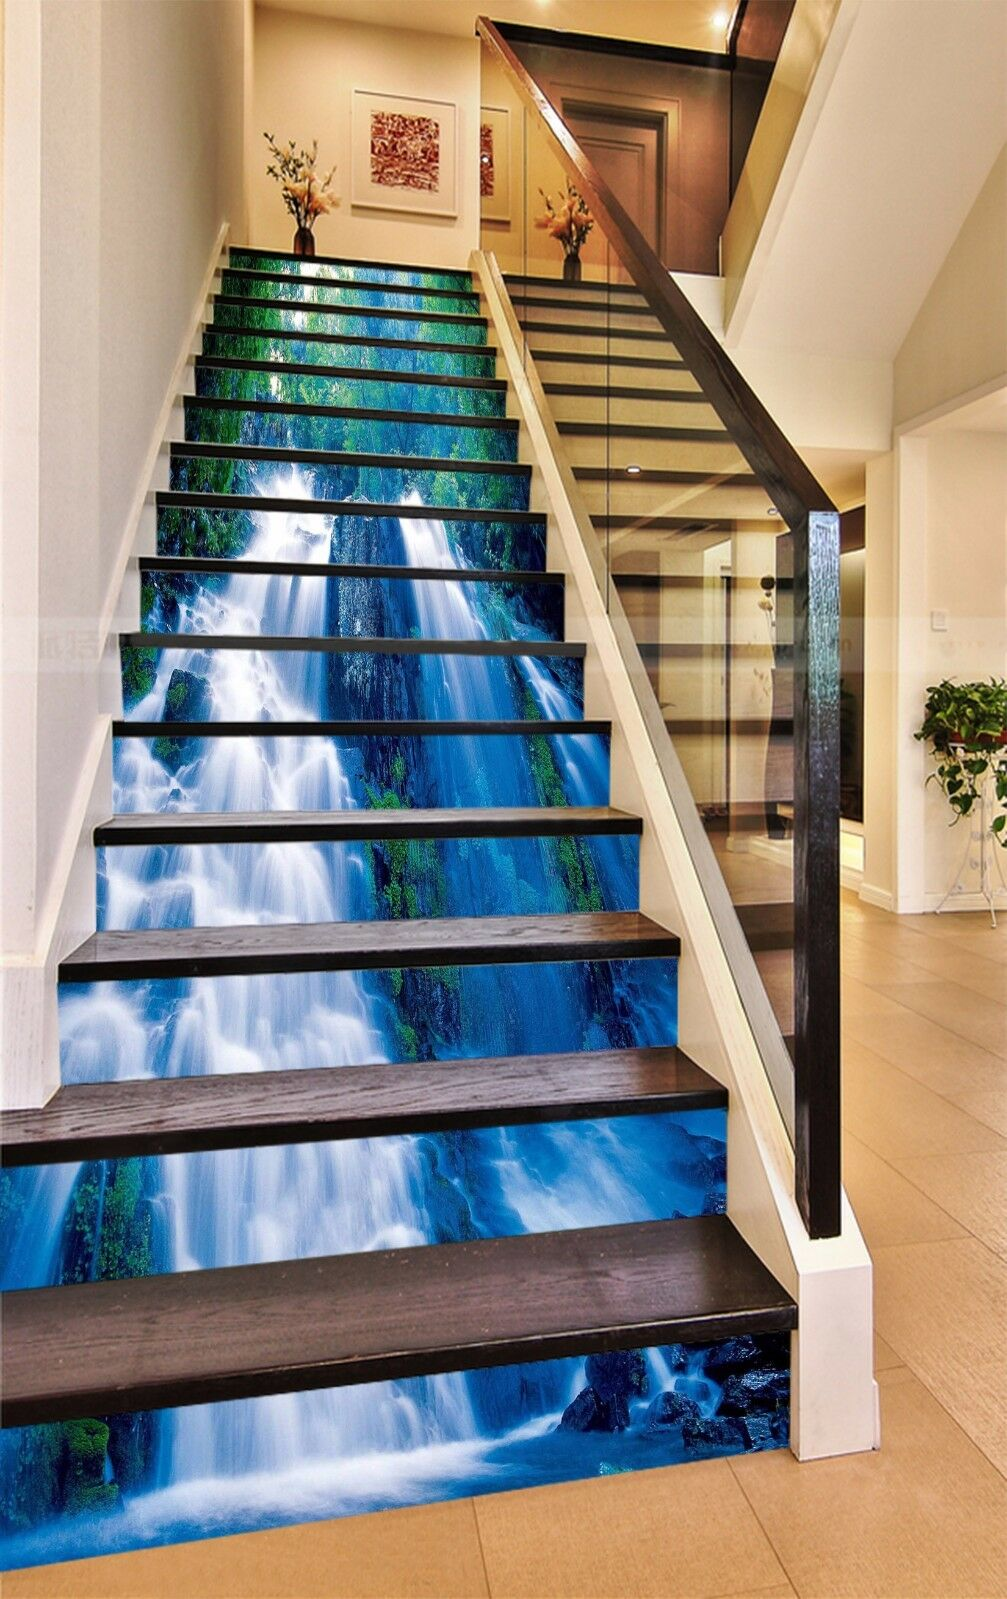 3D Waterfall View 73Stair Risers Decoration Photo Mural Vinyl Decal Wallpaper AU